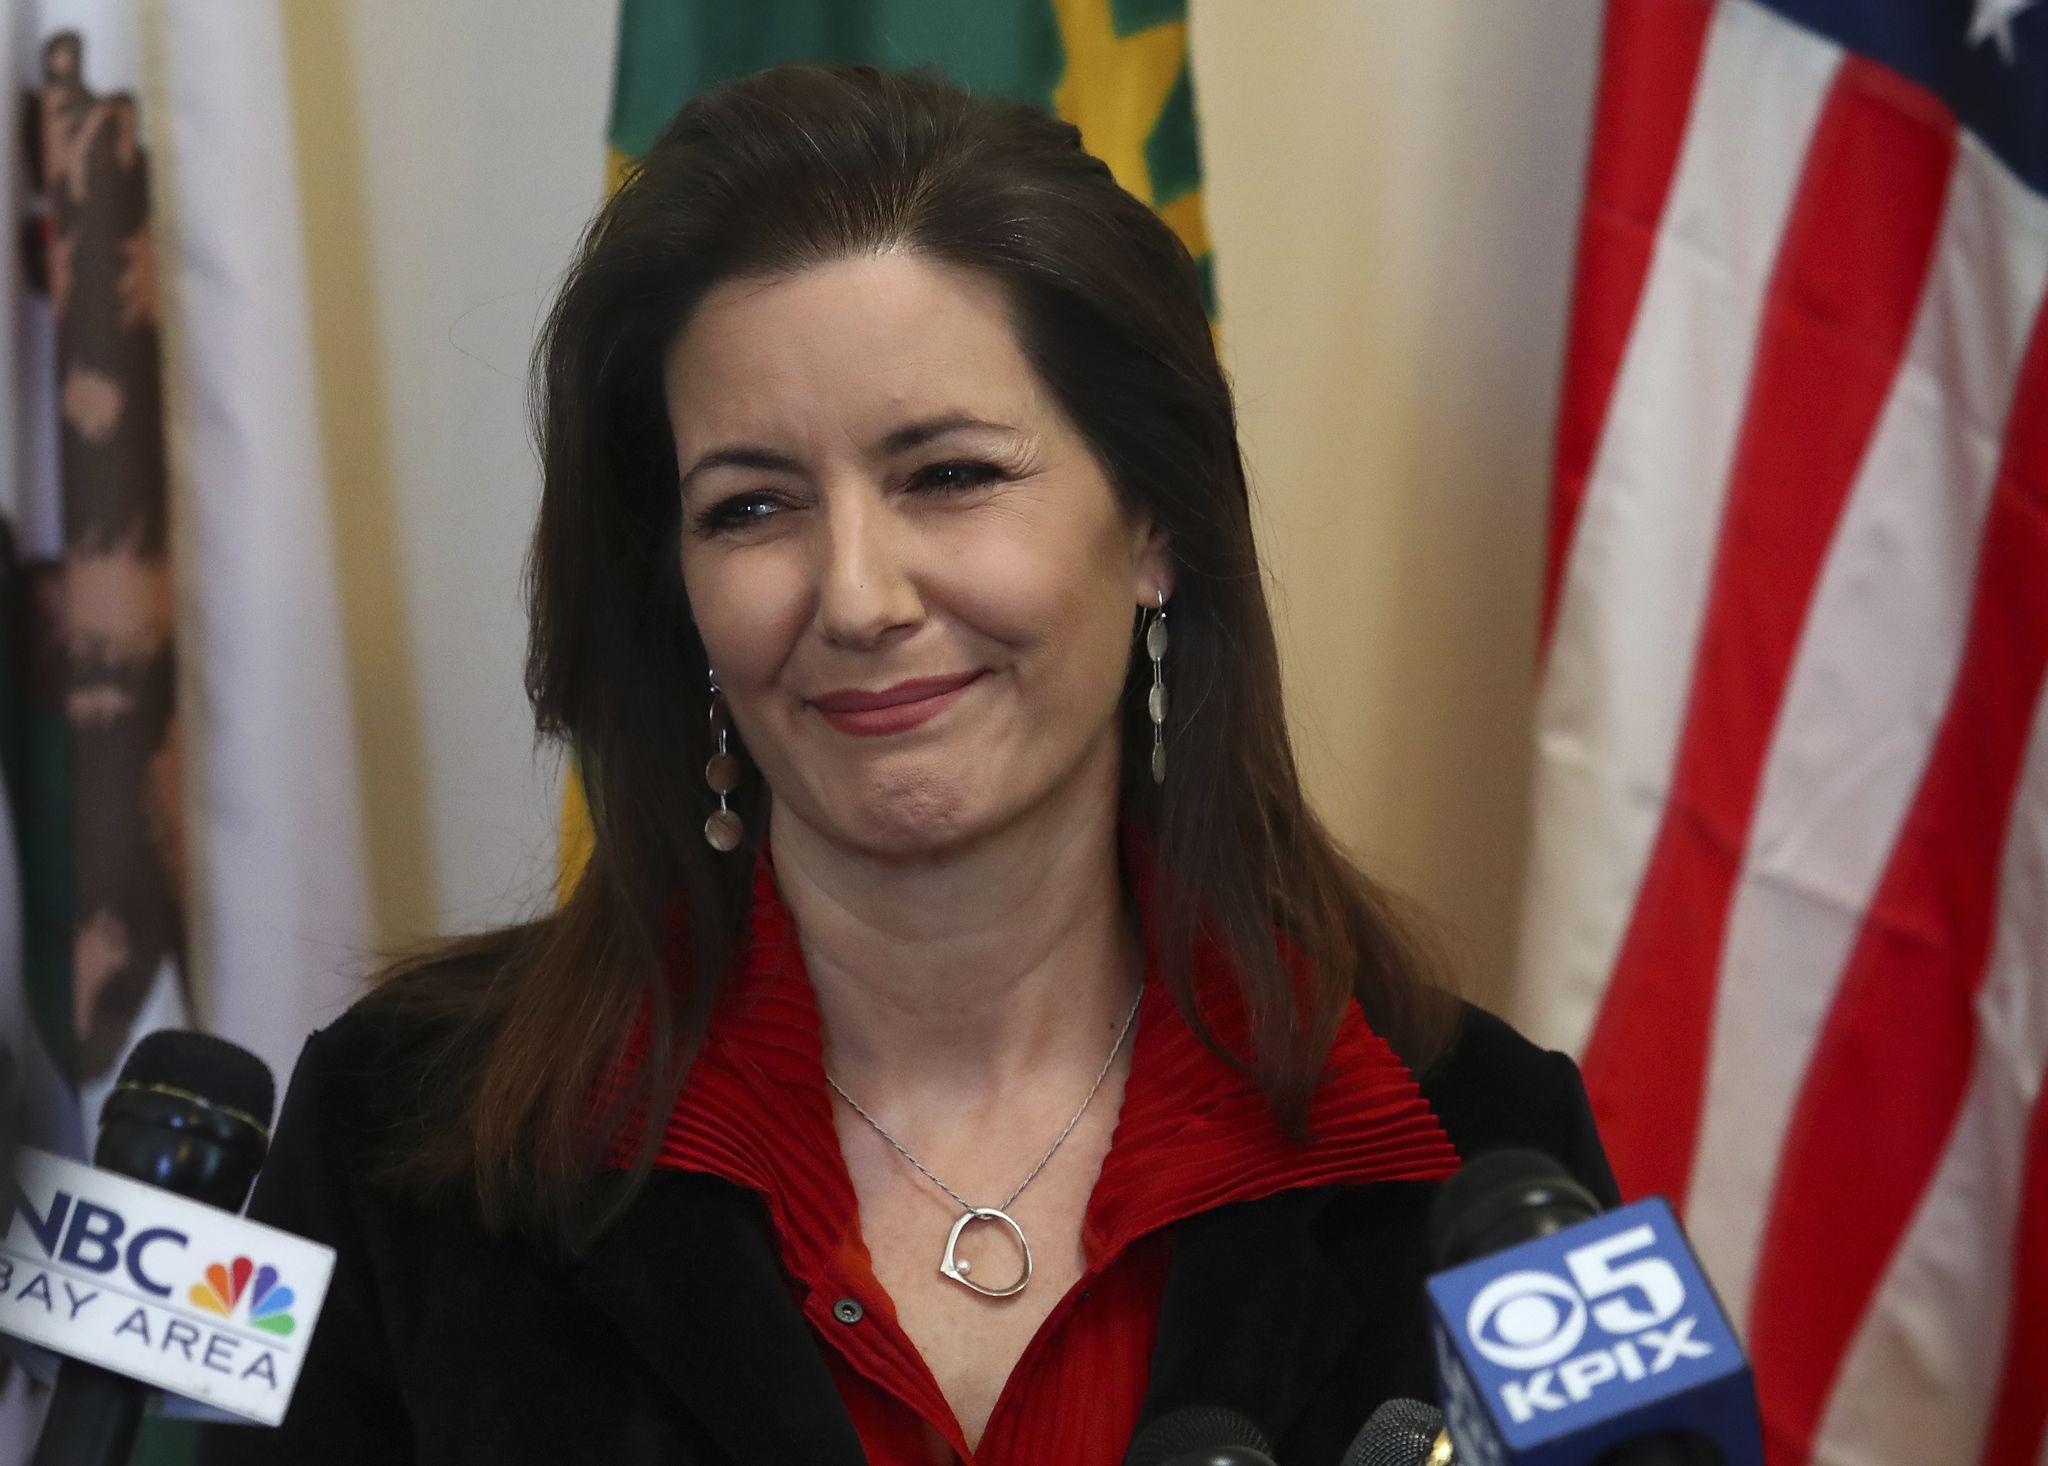 Sanctuary city mayor finds Trump deportation announcement 'ironic'